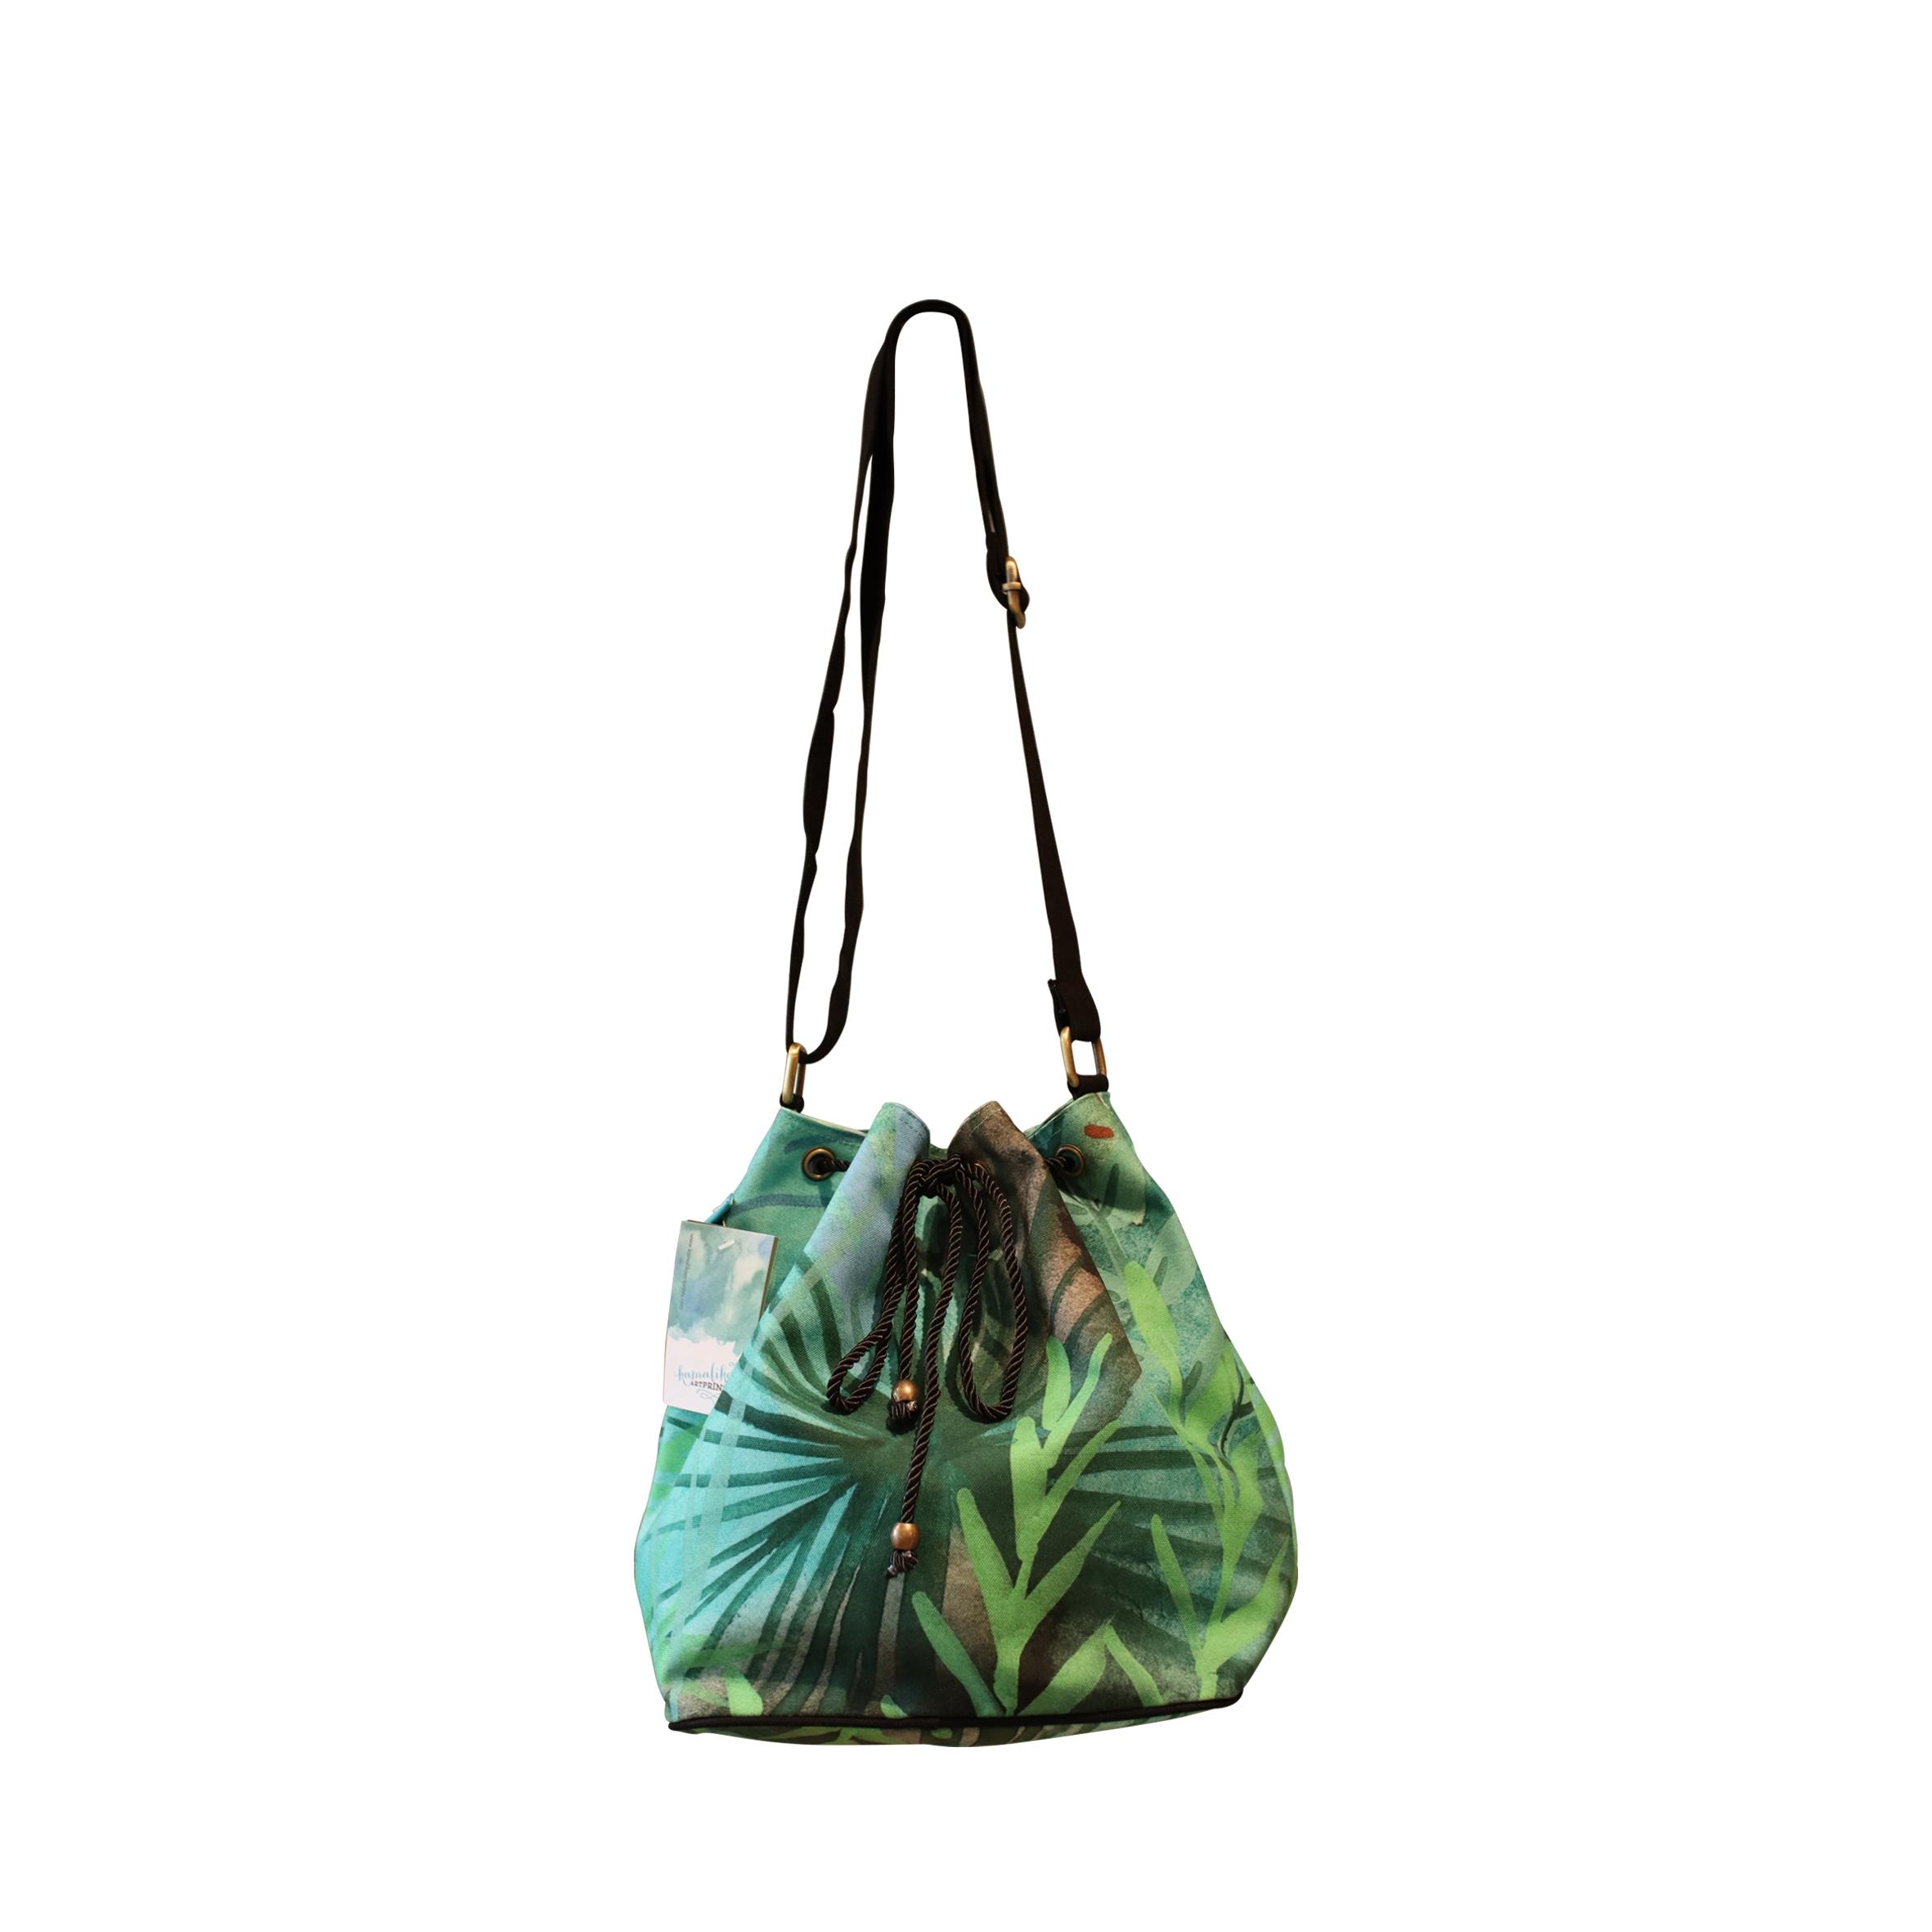 Anggrek Hutan Bucket Sling Bag